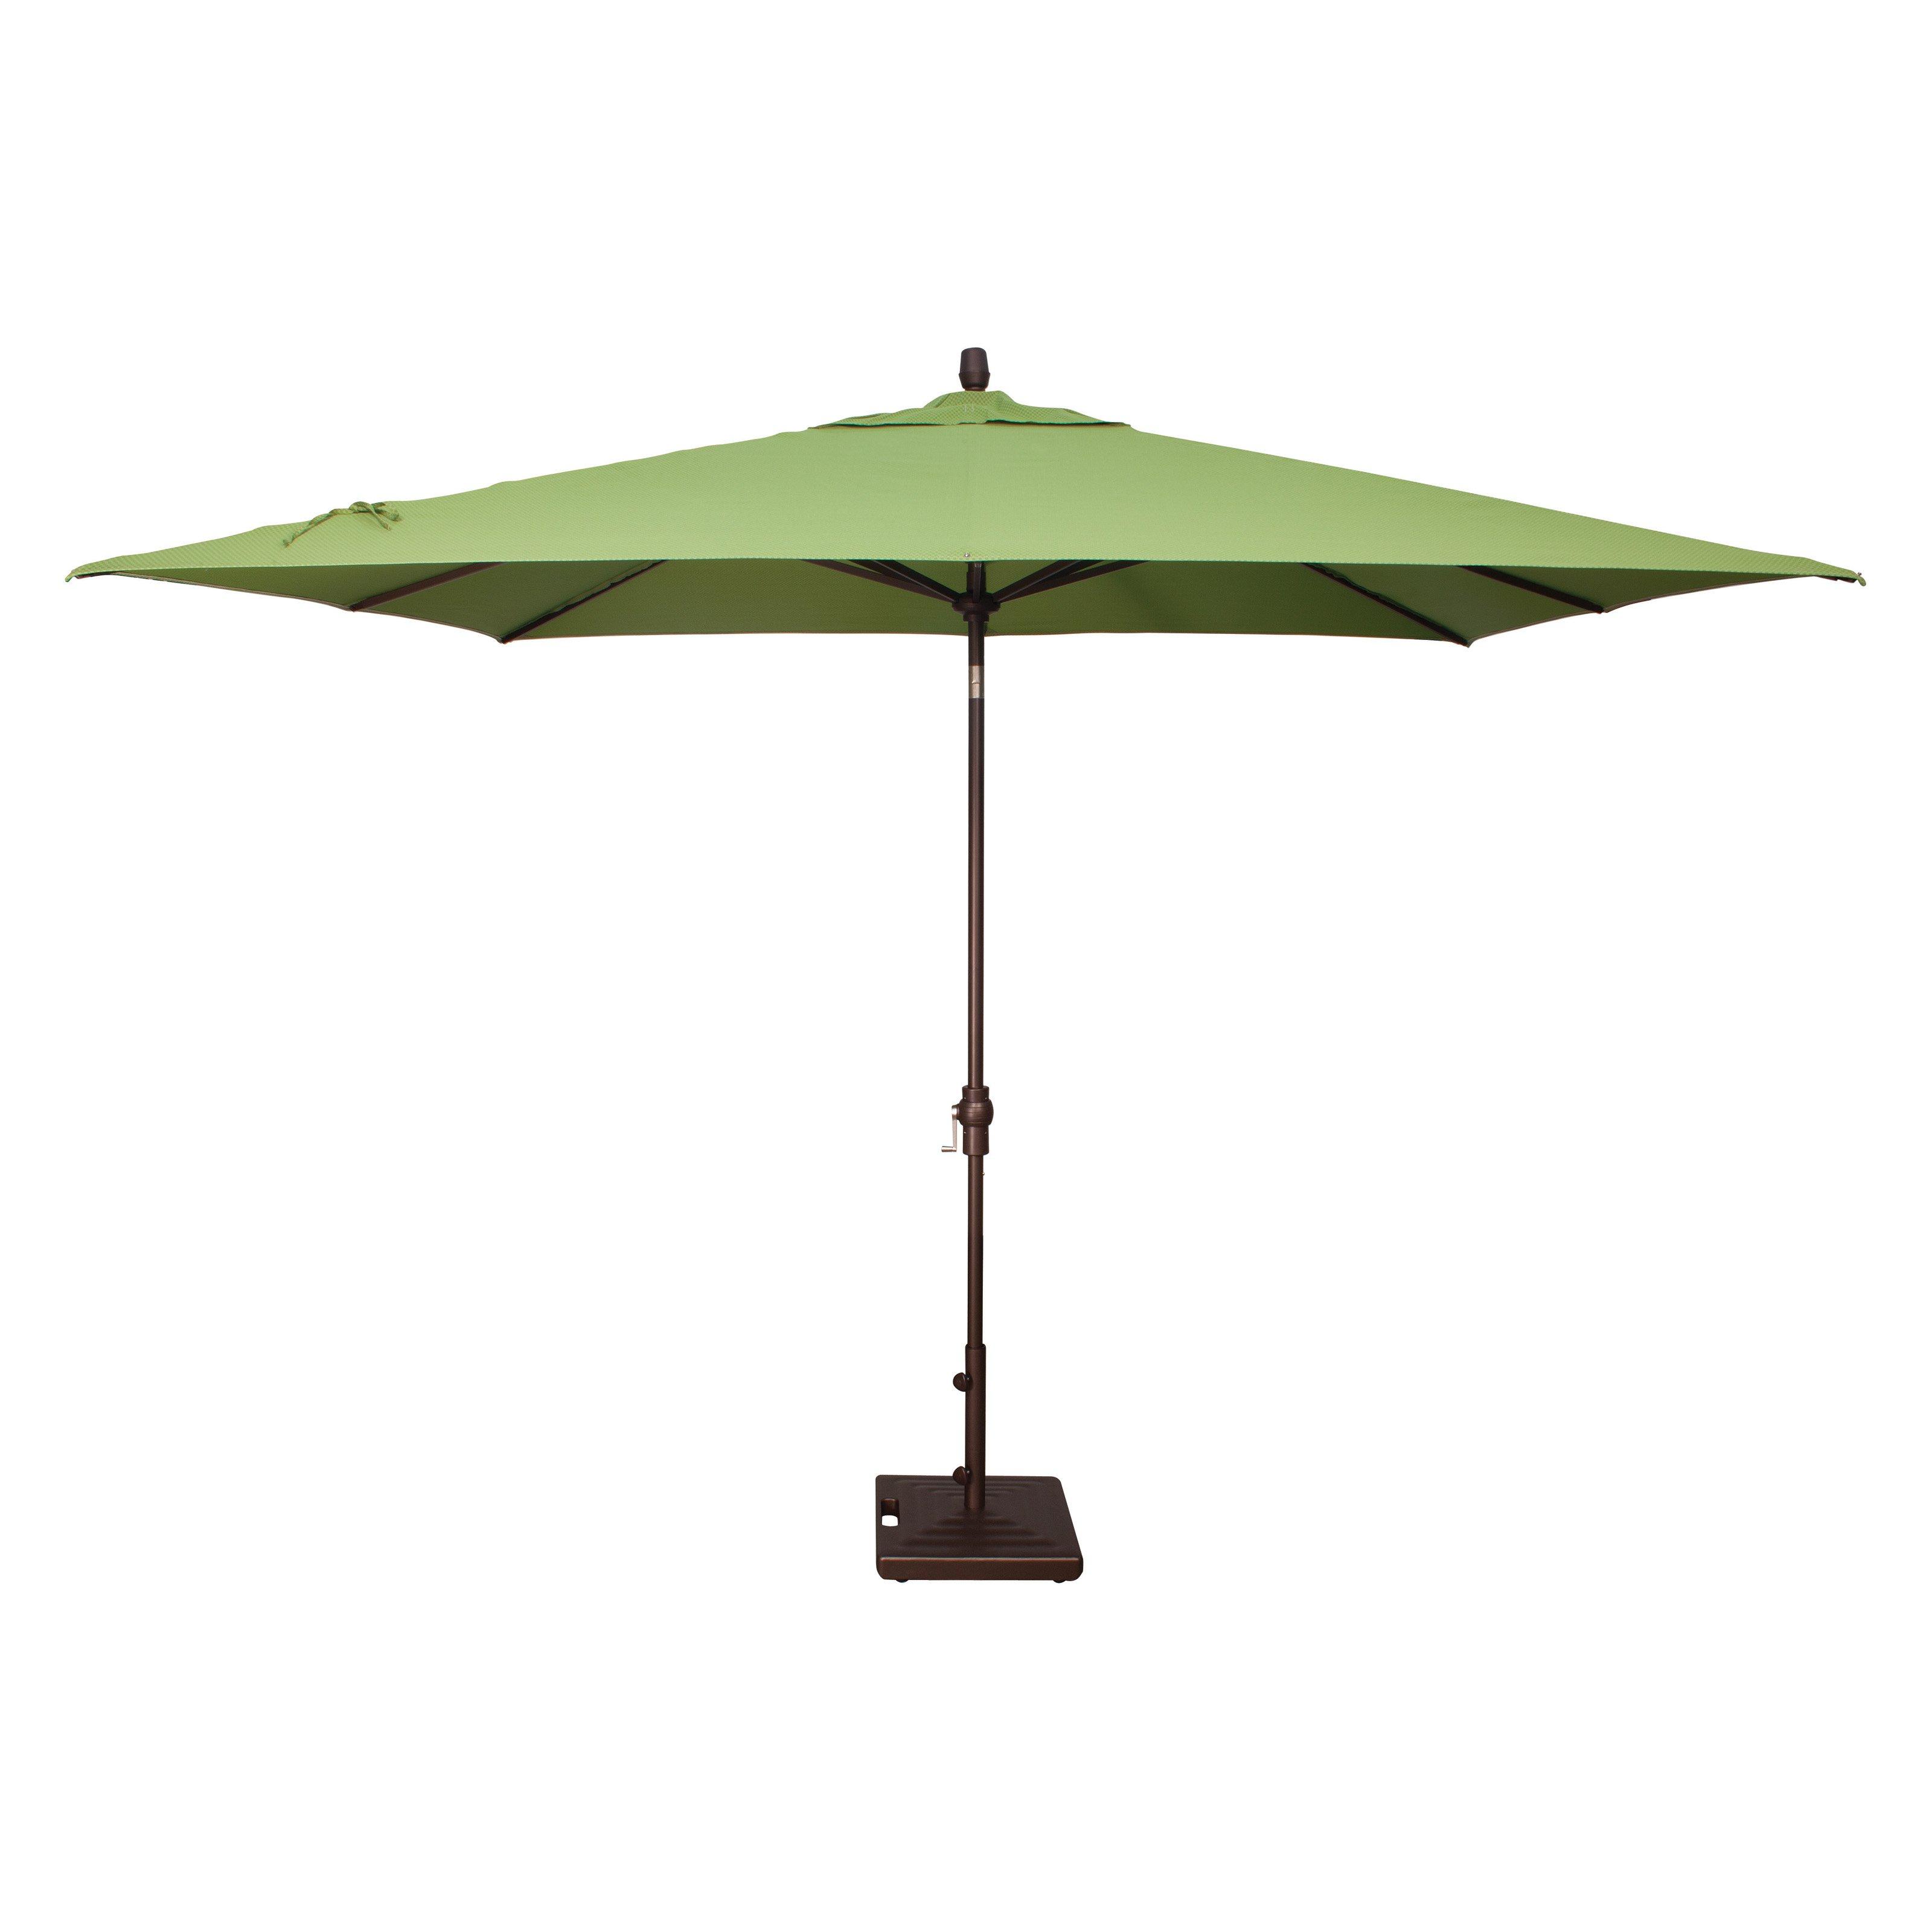 Treasure Garden 8 x 10 ft. Aluminium Auto Tilt Patio Umbrella